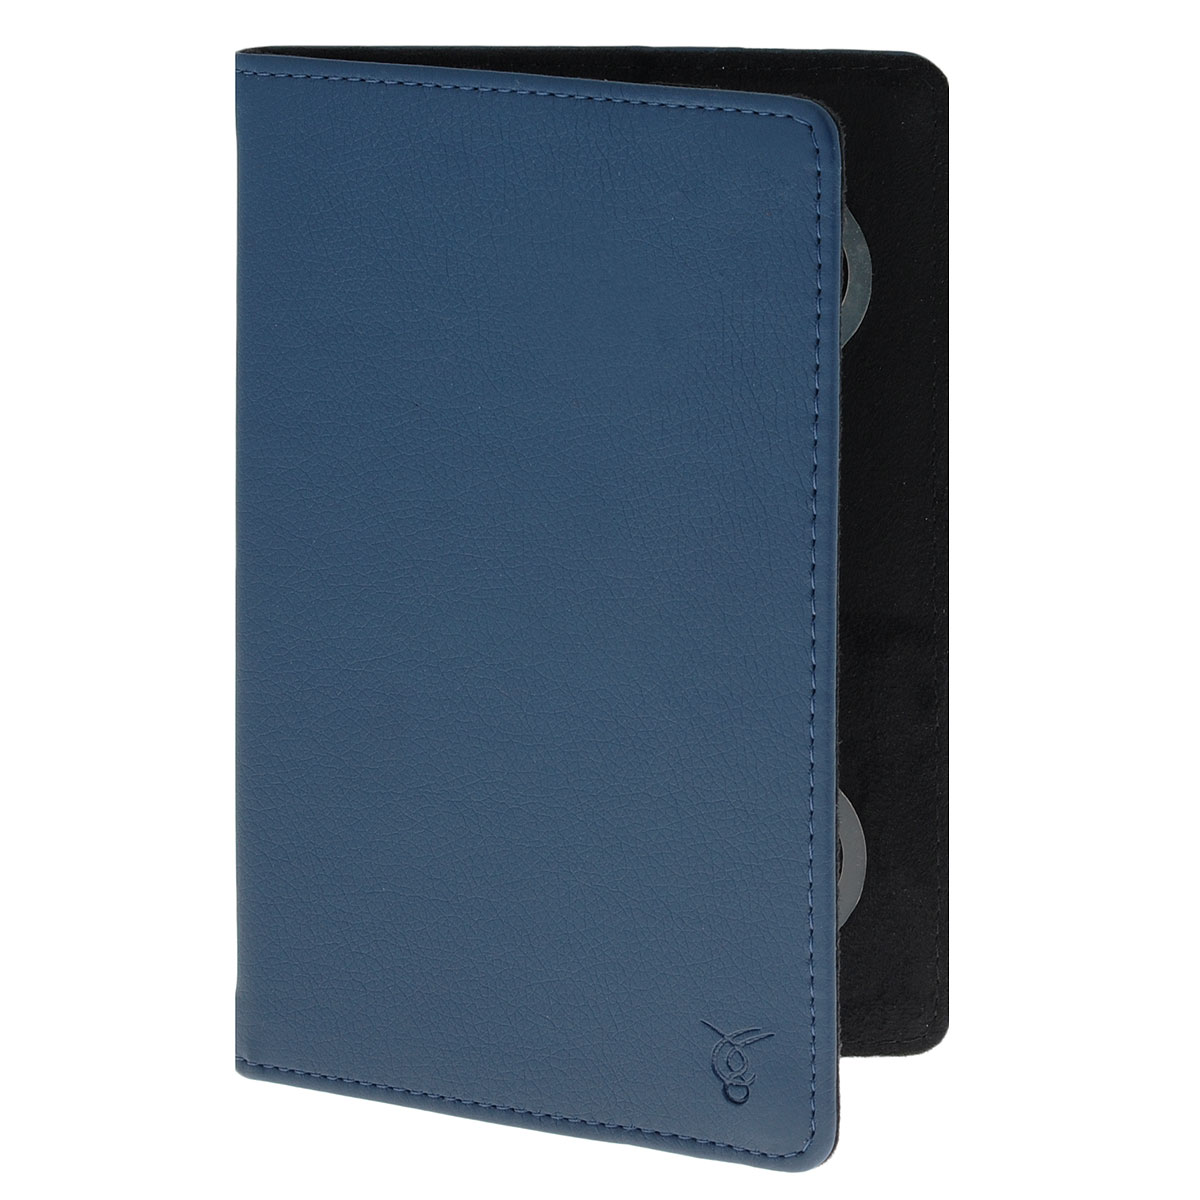 Vivacase Basic чехол для планшетов 7, Blue (VUC-CBS07-blue)